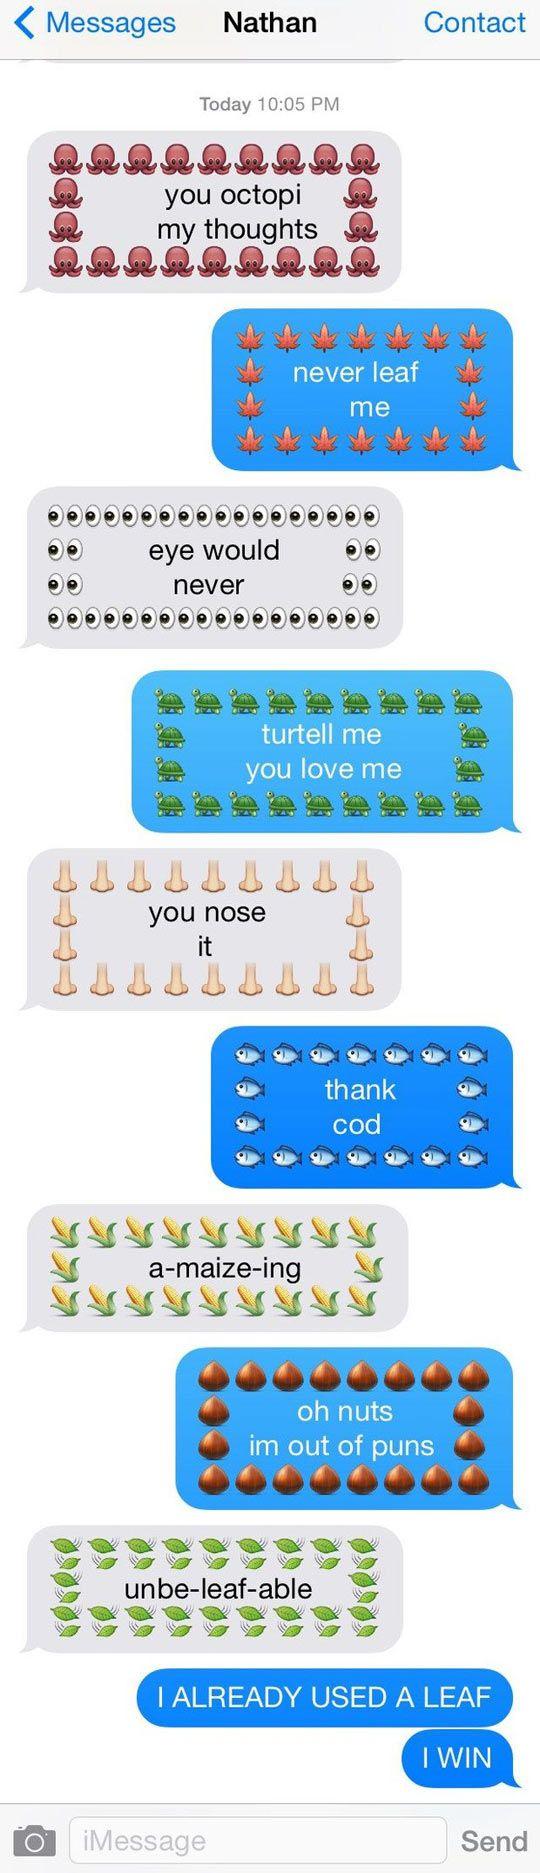 eecab967cef4be5f36bdc53e0084b054 corny puns puns jokes funny emoji text message fun for olivia pinterest funny